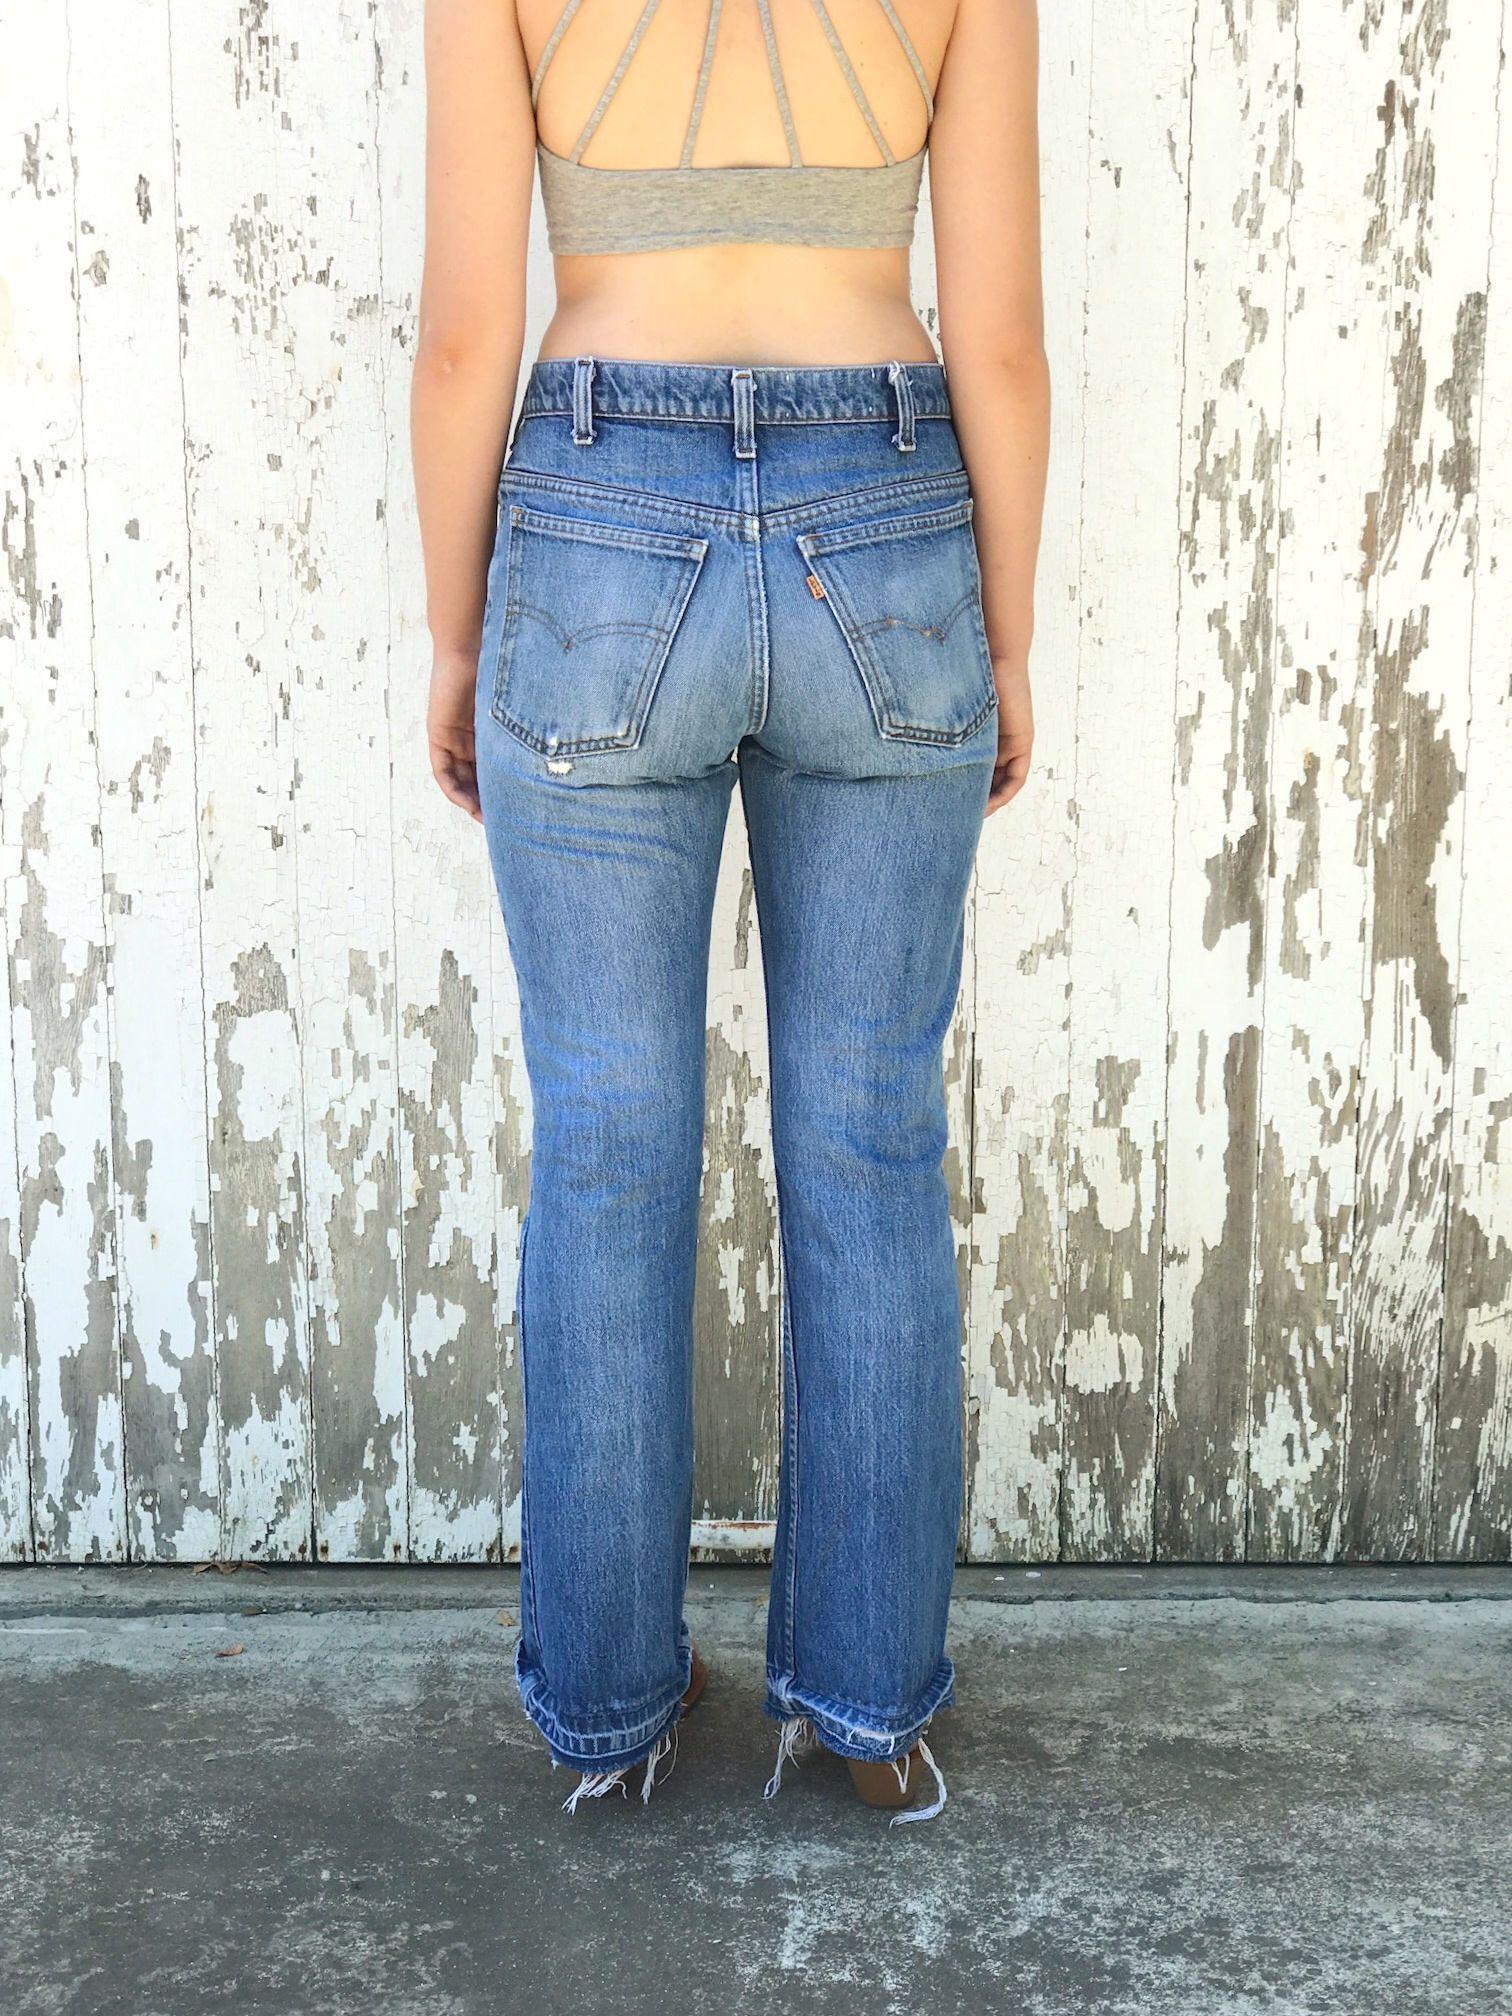 13c1285cd49 Bell Bottom Jeans · LEVIS 646 Jeans 30 Waist Flares Orange Tab Vintage 70s  by HuntedFinds on Etsy https: